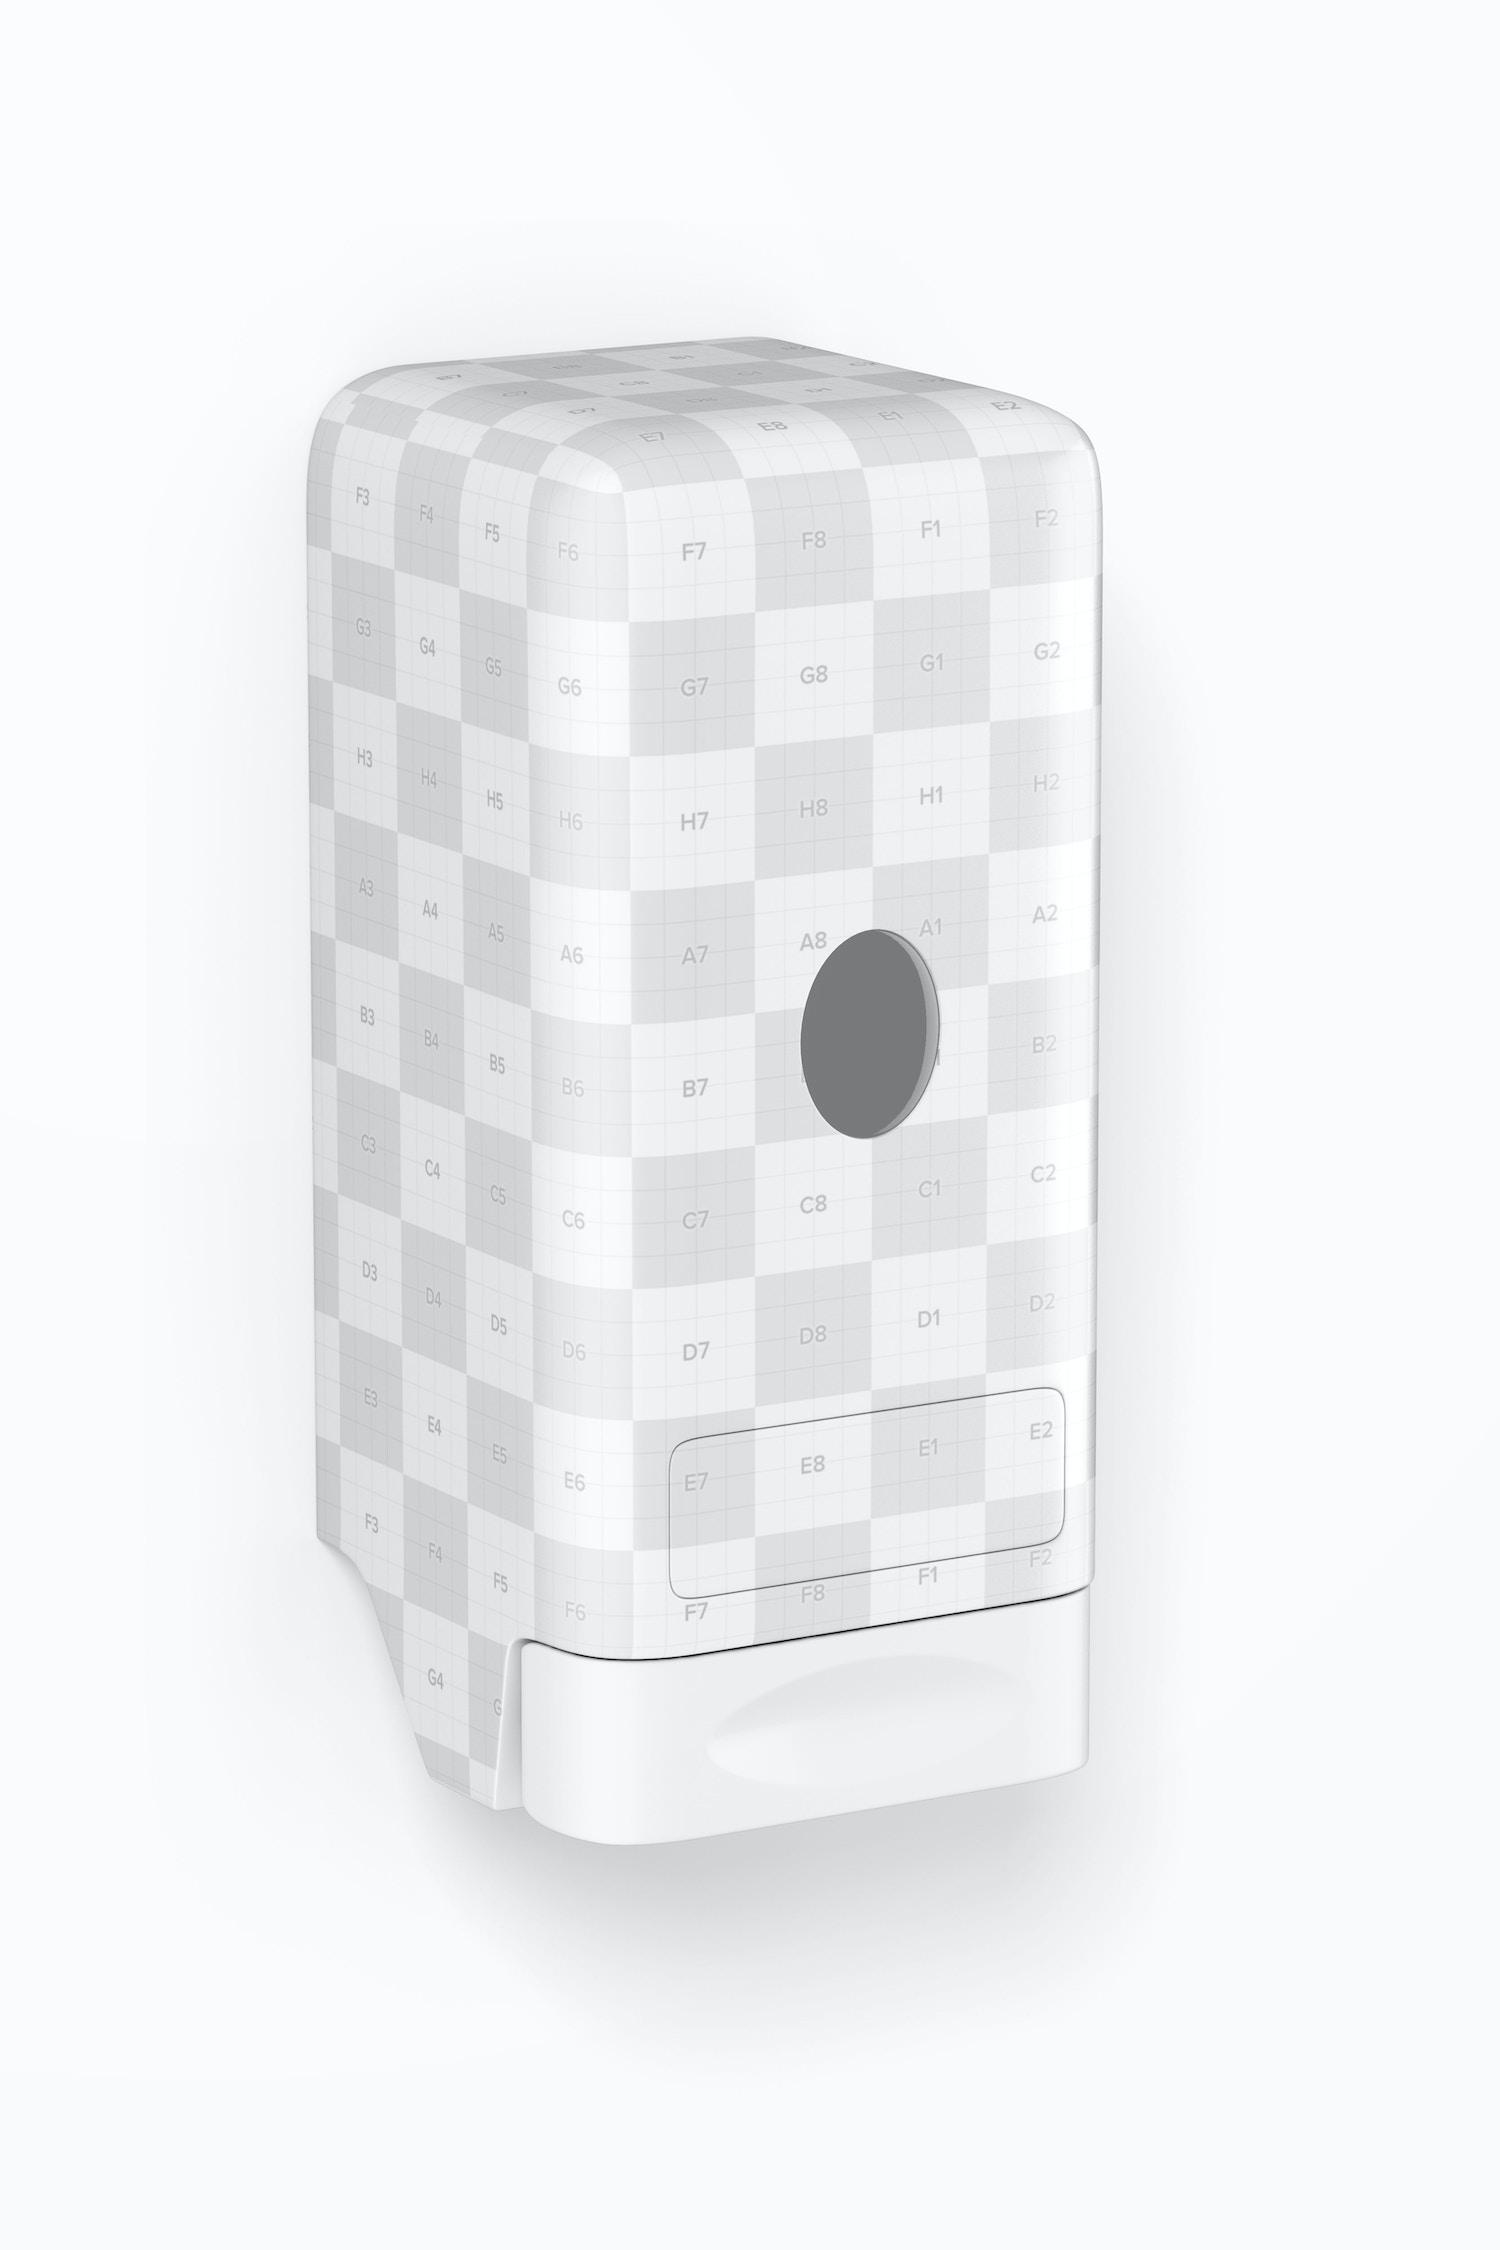 Liquid Soap Dispenser Mockup, Right View